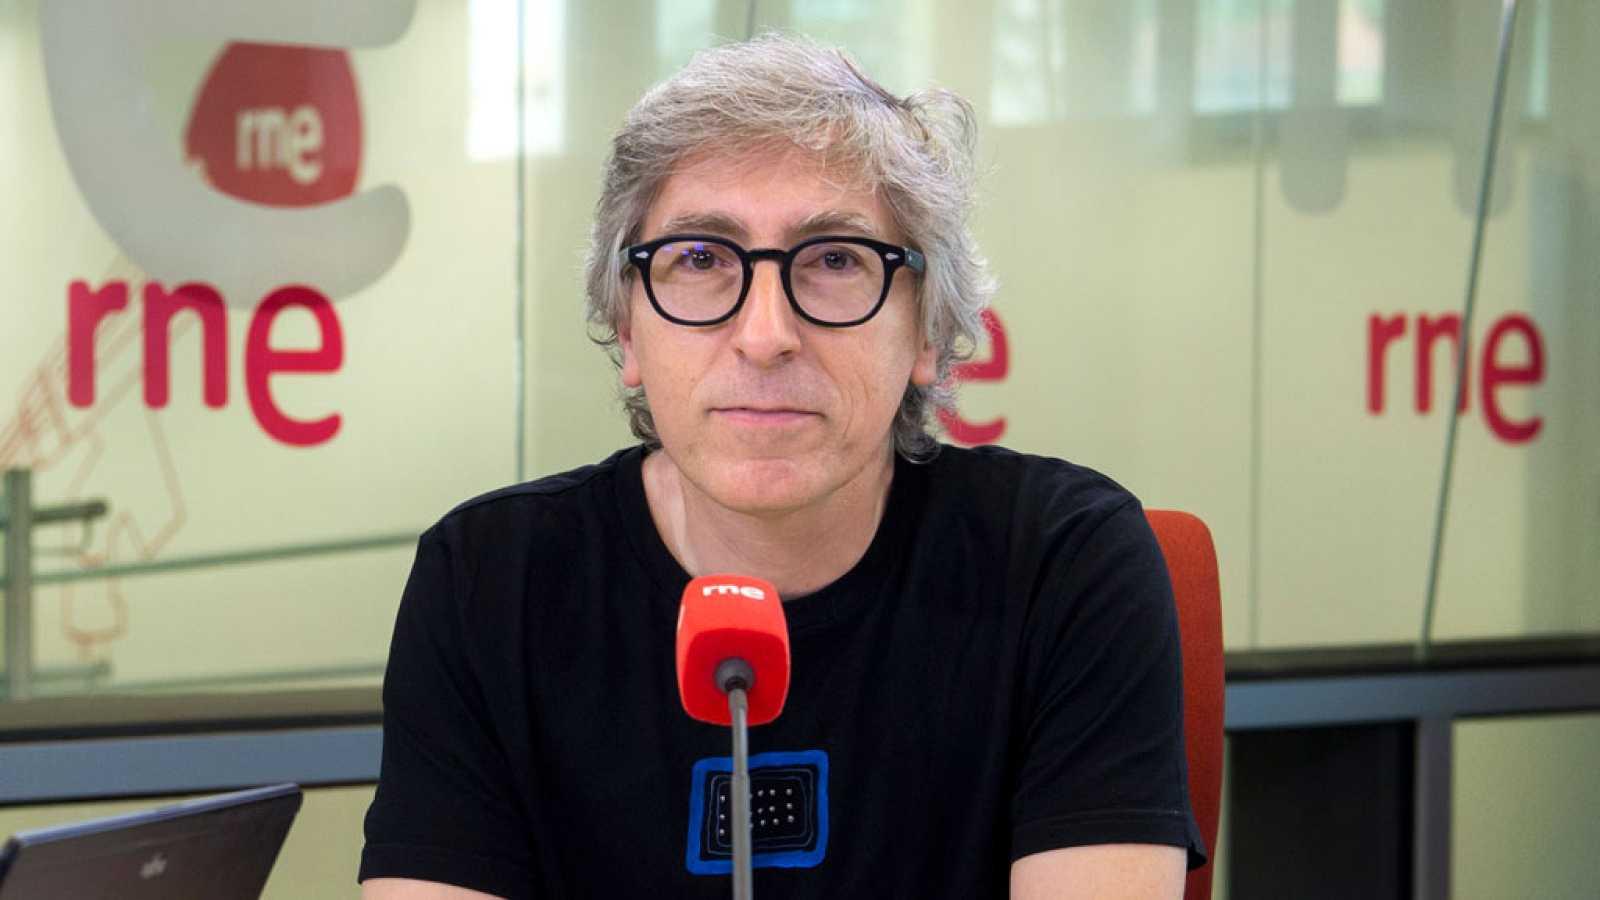 Las mañanas de RNE - David Trueba vuelve a apostar por Lucía Jiménez y Fernando Ramallo para 'Casi 40' - Escuchar ahora